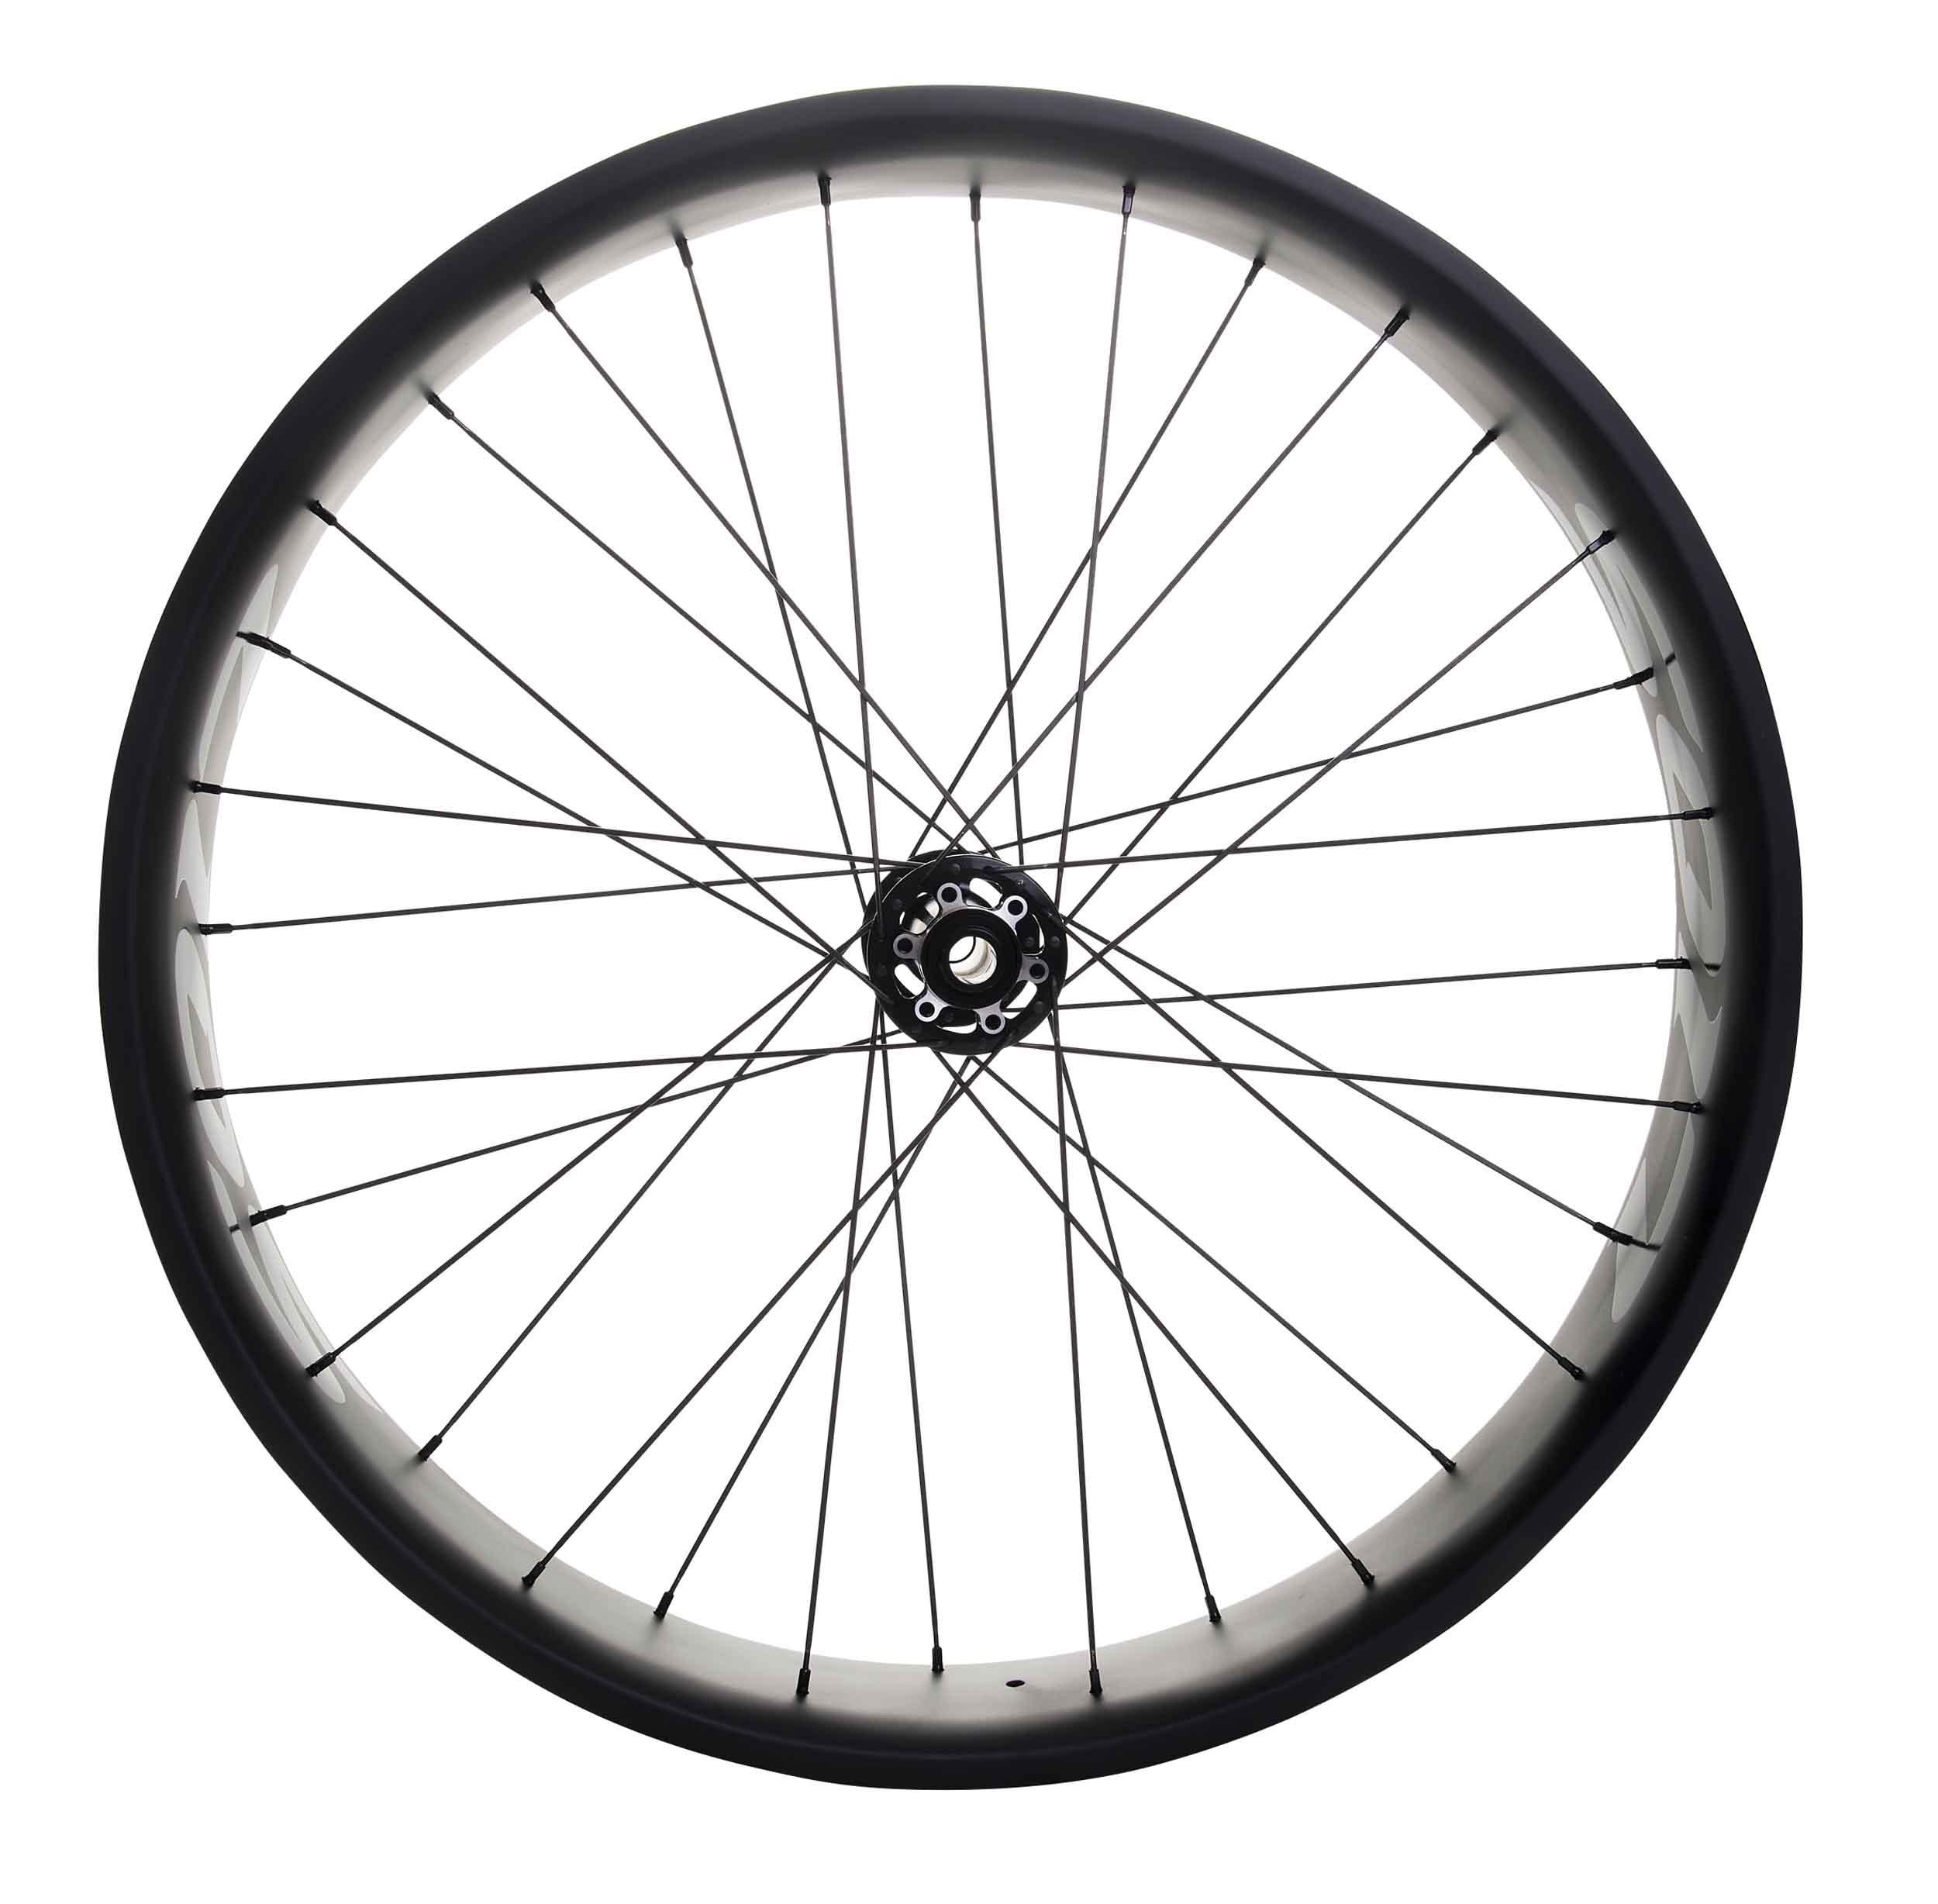 lios-carbon-fatbike-wheelset-black-image-3.jpg